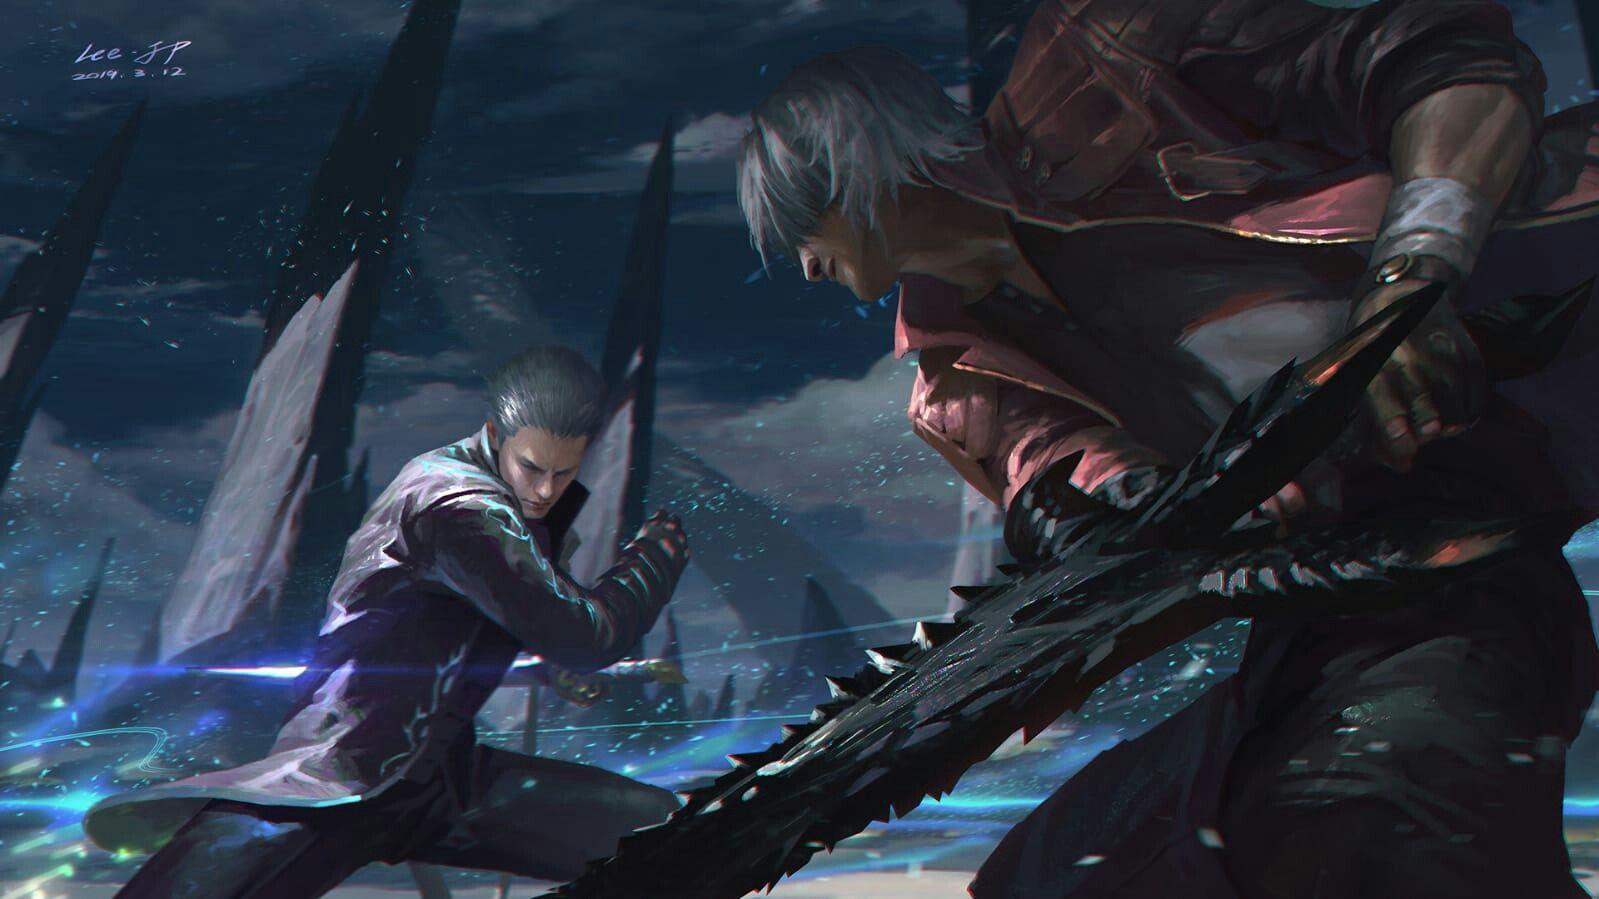 Pin On Dragon Ball Dante devil may cry 5 wallpaper hd